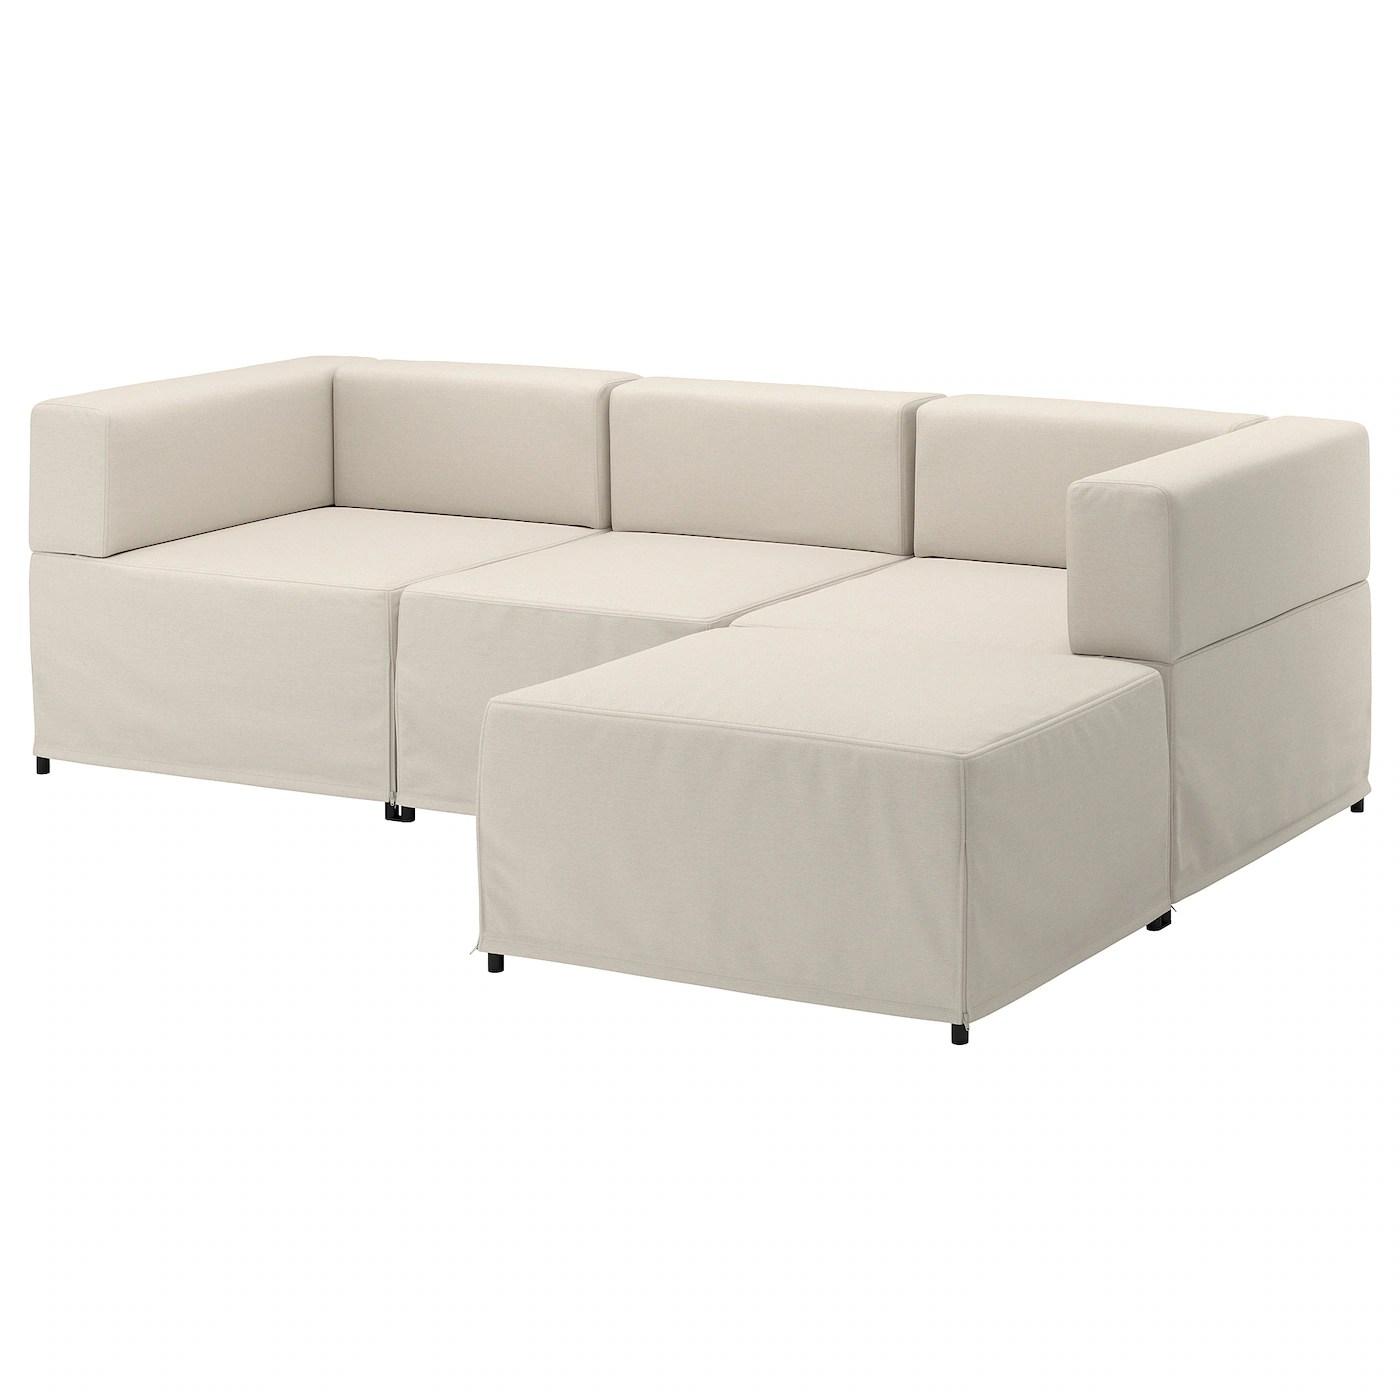 ver sofas no olx do es reclining sectional sofa modern canapés modulables en u de 4 5 6 7 places ou plus ikea